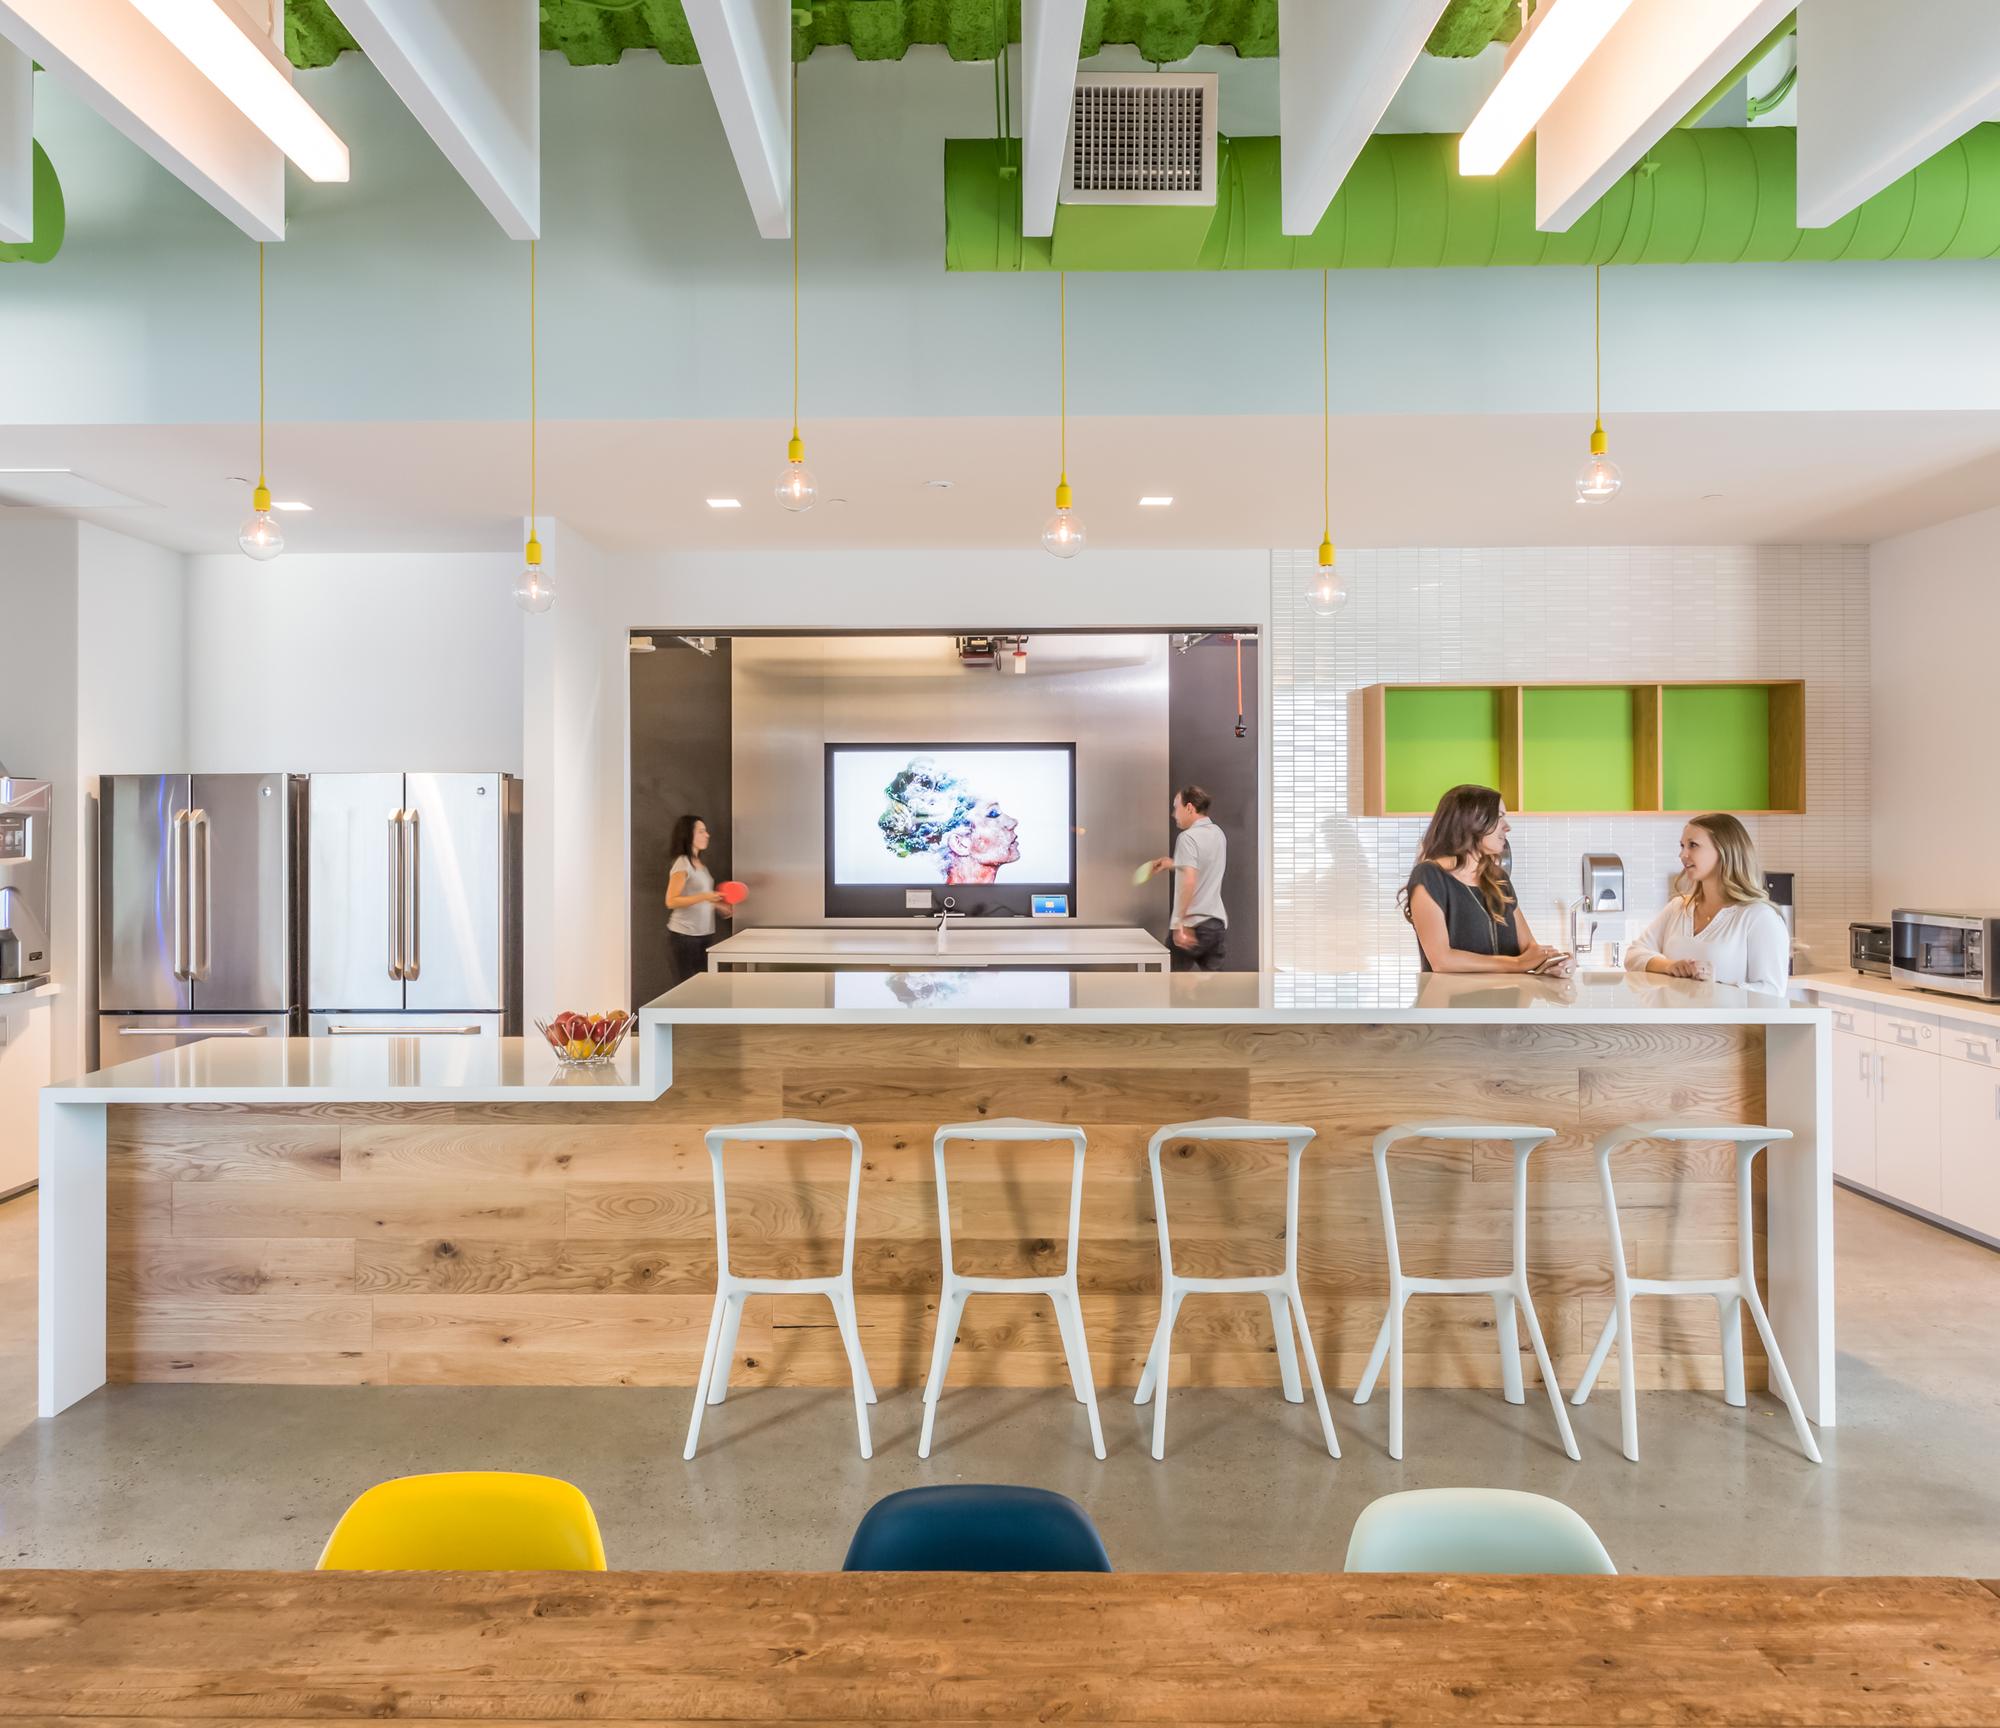 Gallery Of Adobe Headquarters Renovation / Gensler